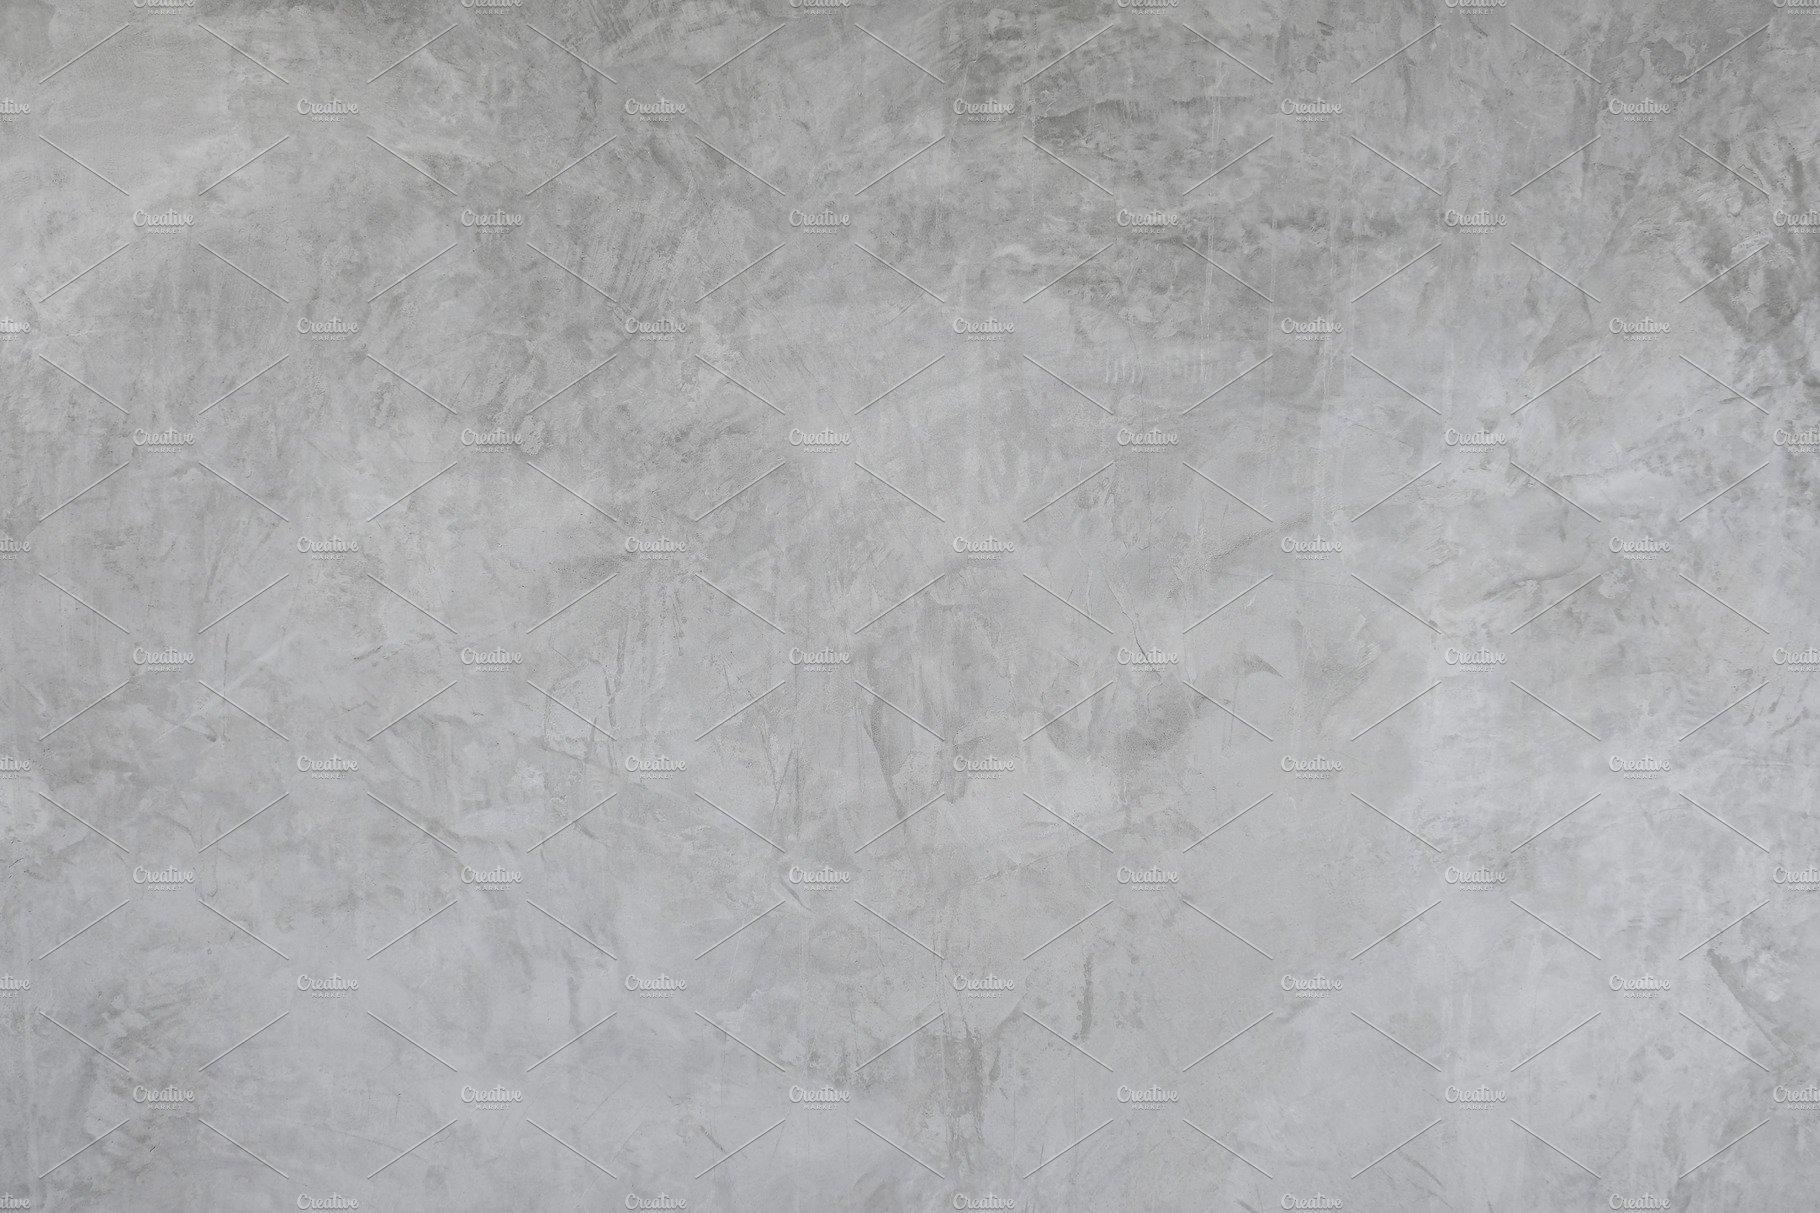 Bare Mortar Cement Wall Architecture Photos Creative